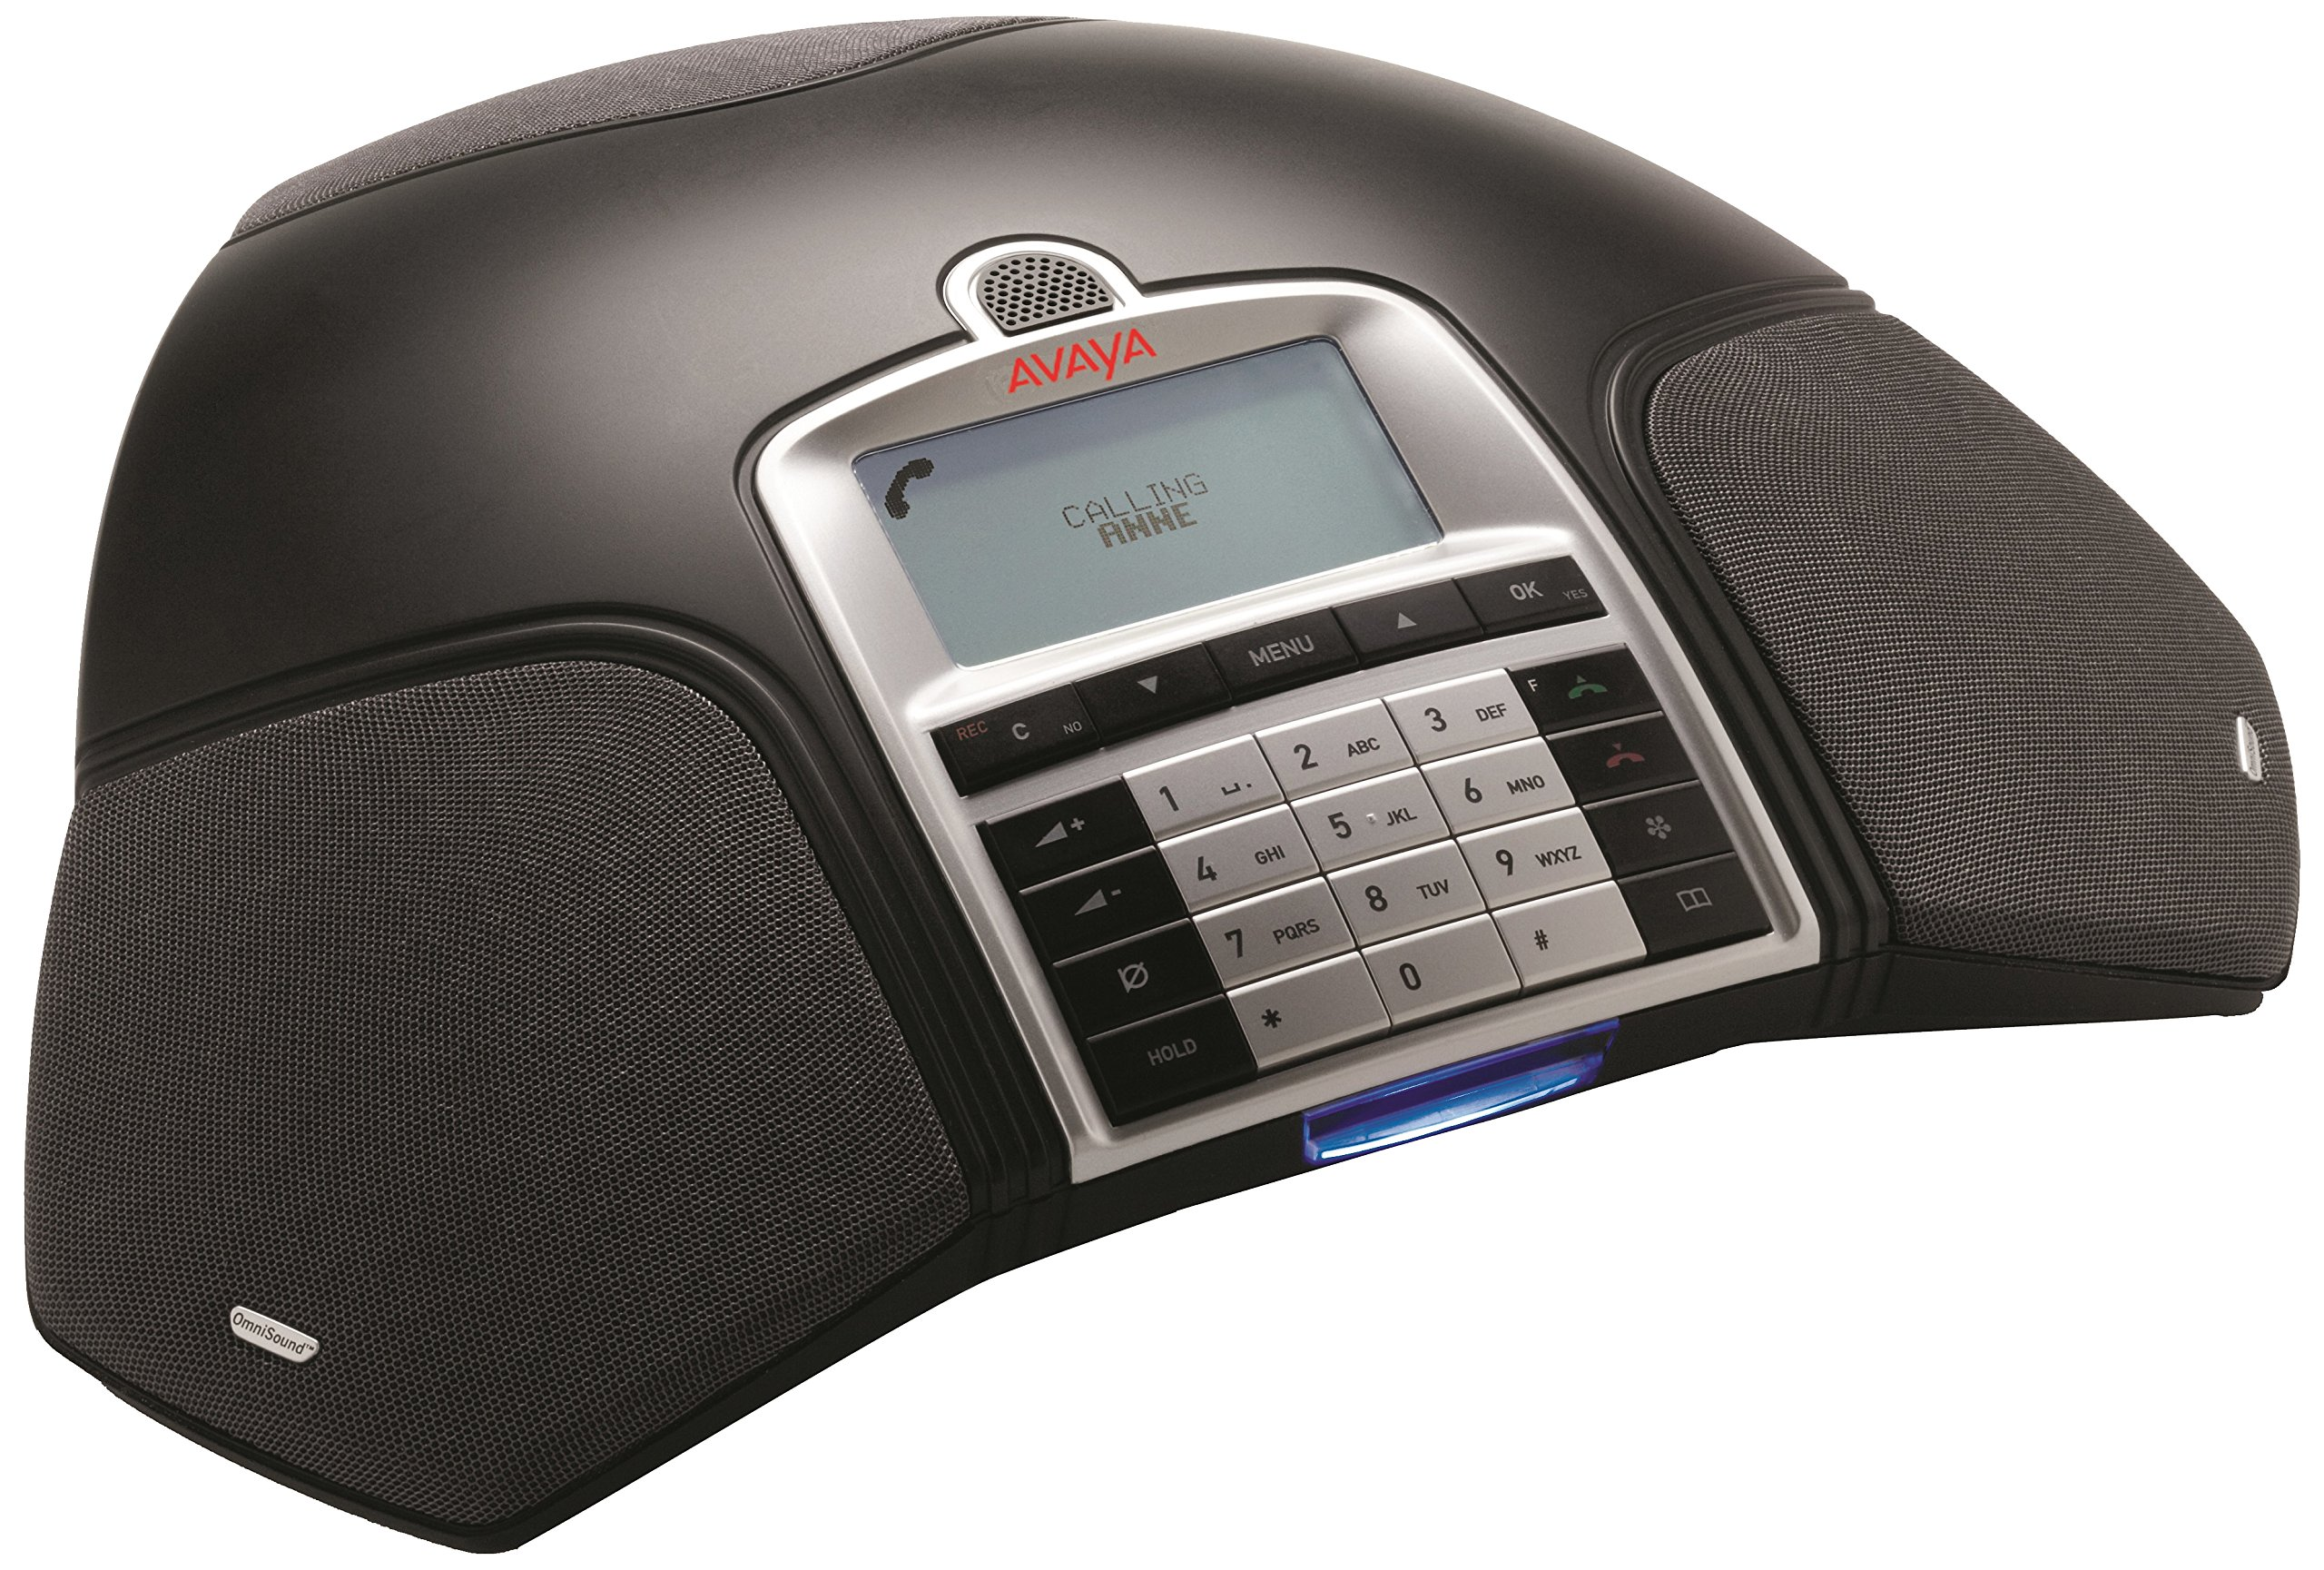 Avaya B159 Conference Phone